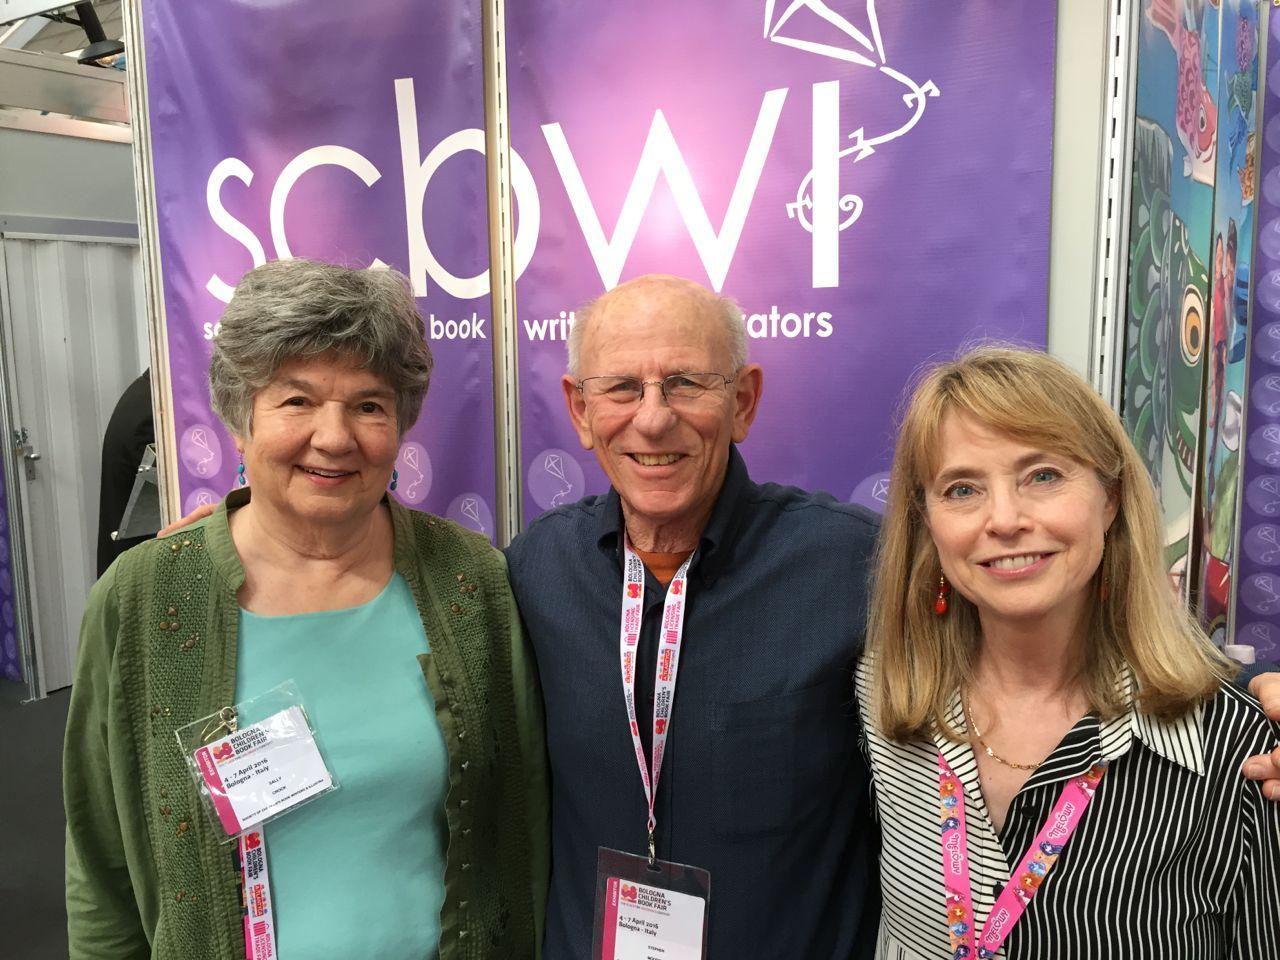 Sally Crock & Steve Mooser